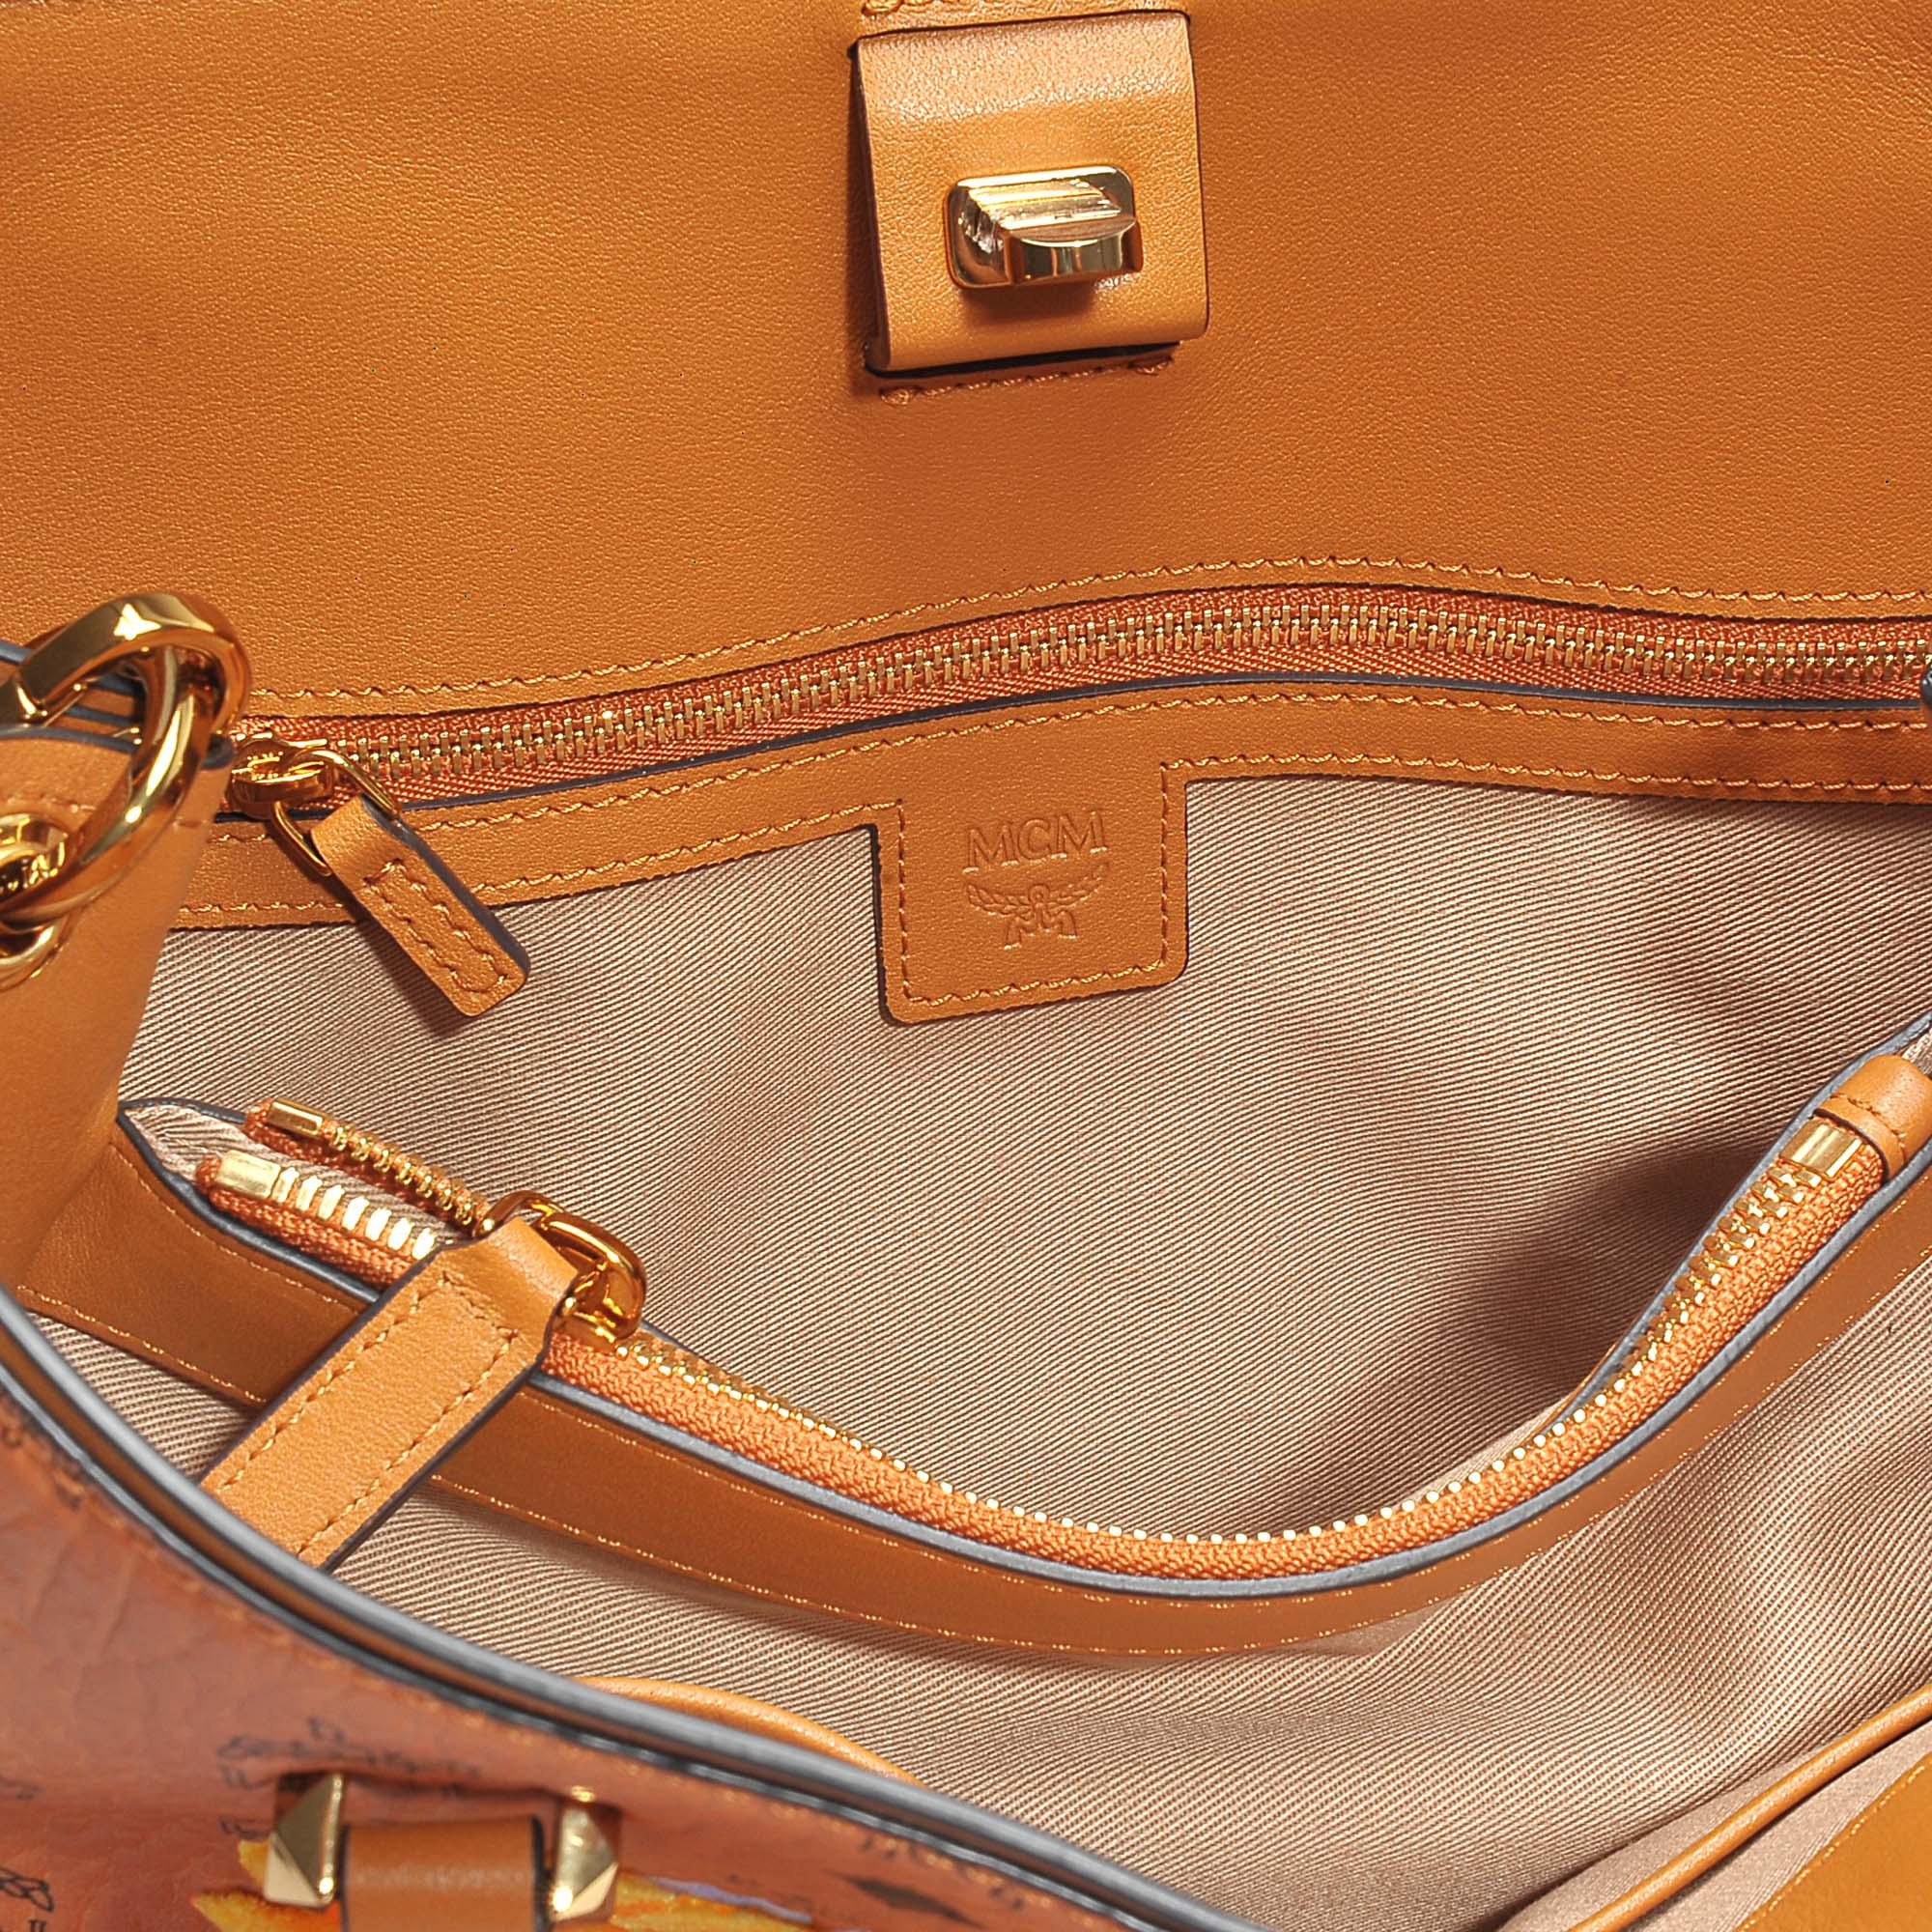 MCM Flower Crossbody Tote Bag In Cognac Coated Cotton